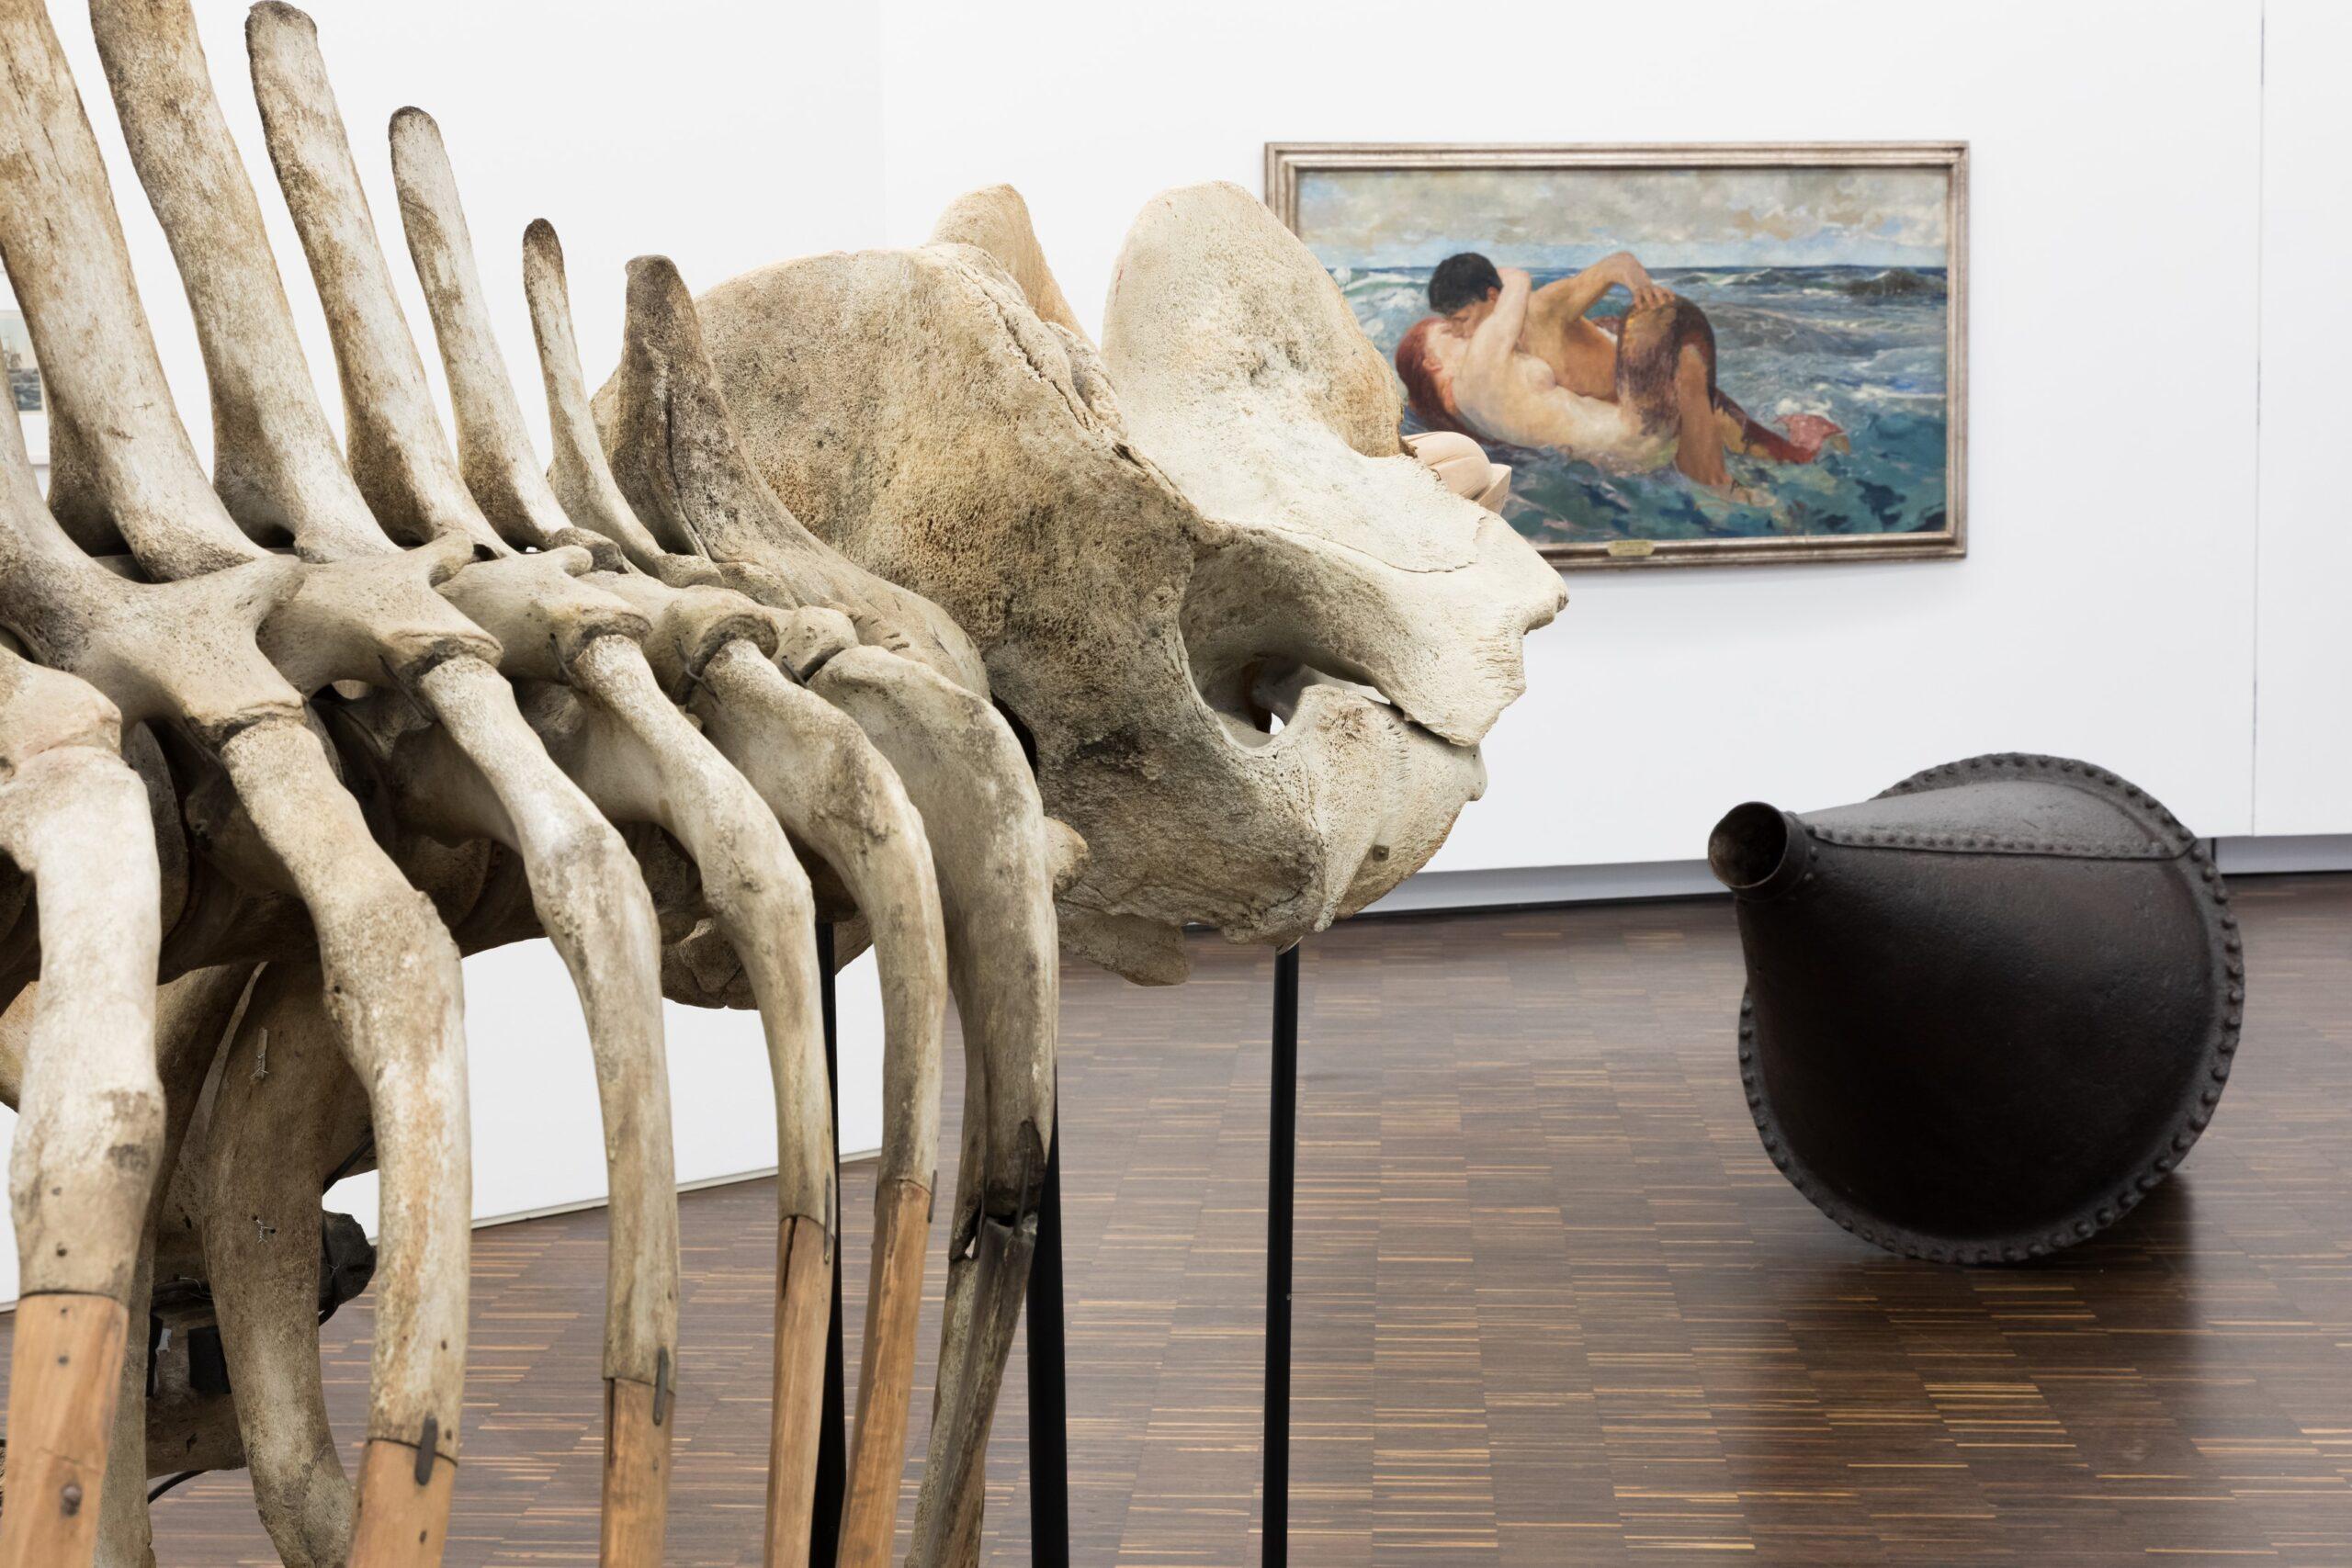 Museum La8 Hohesee Walskelett Boje F Jesse Kl